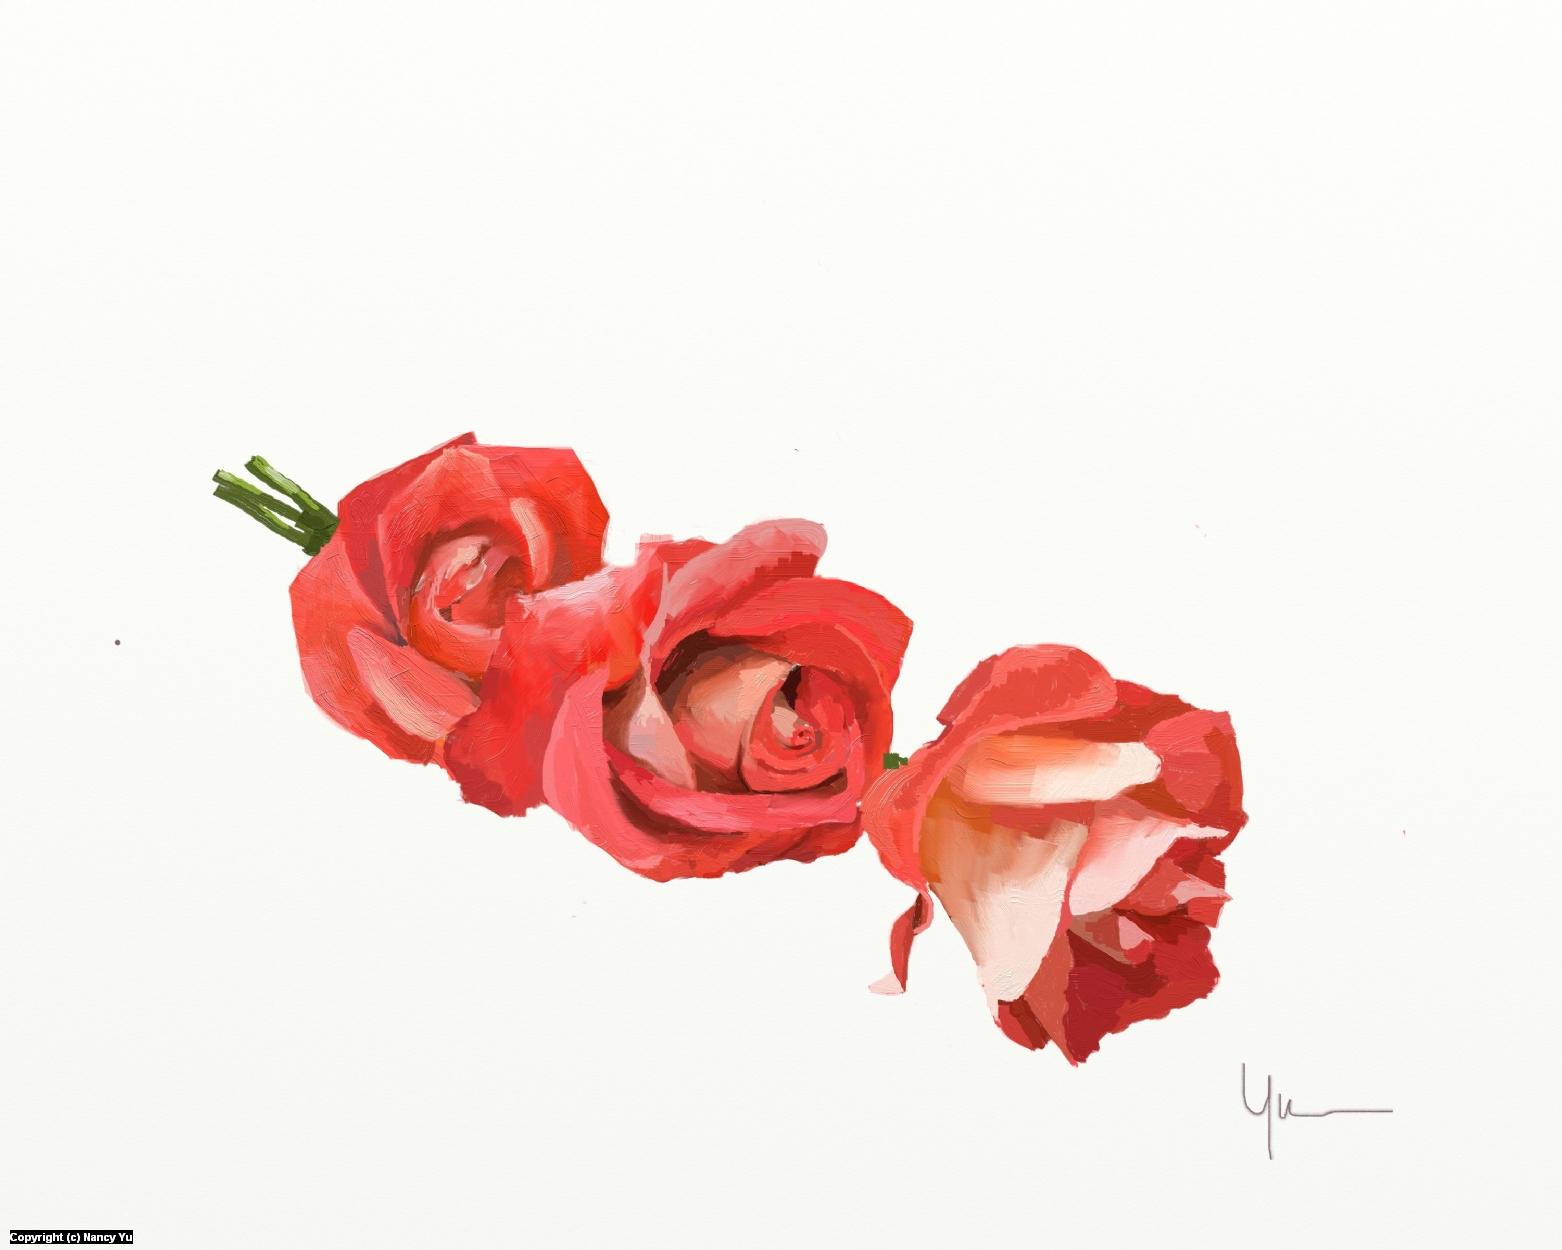 Day 29 Rose Artwork by Nancy Yu